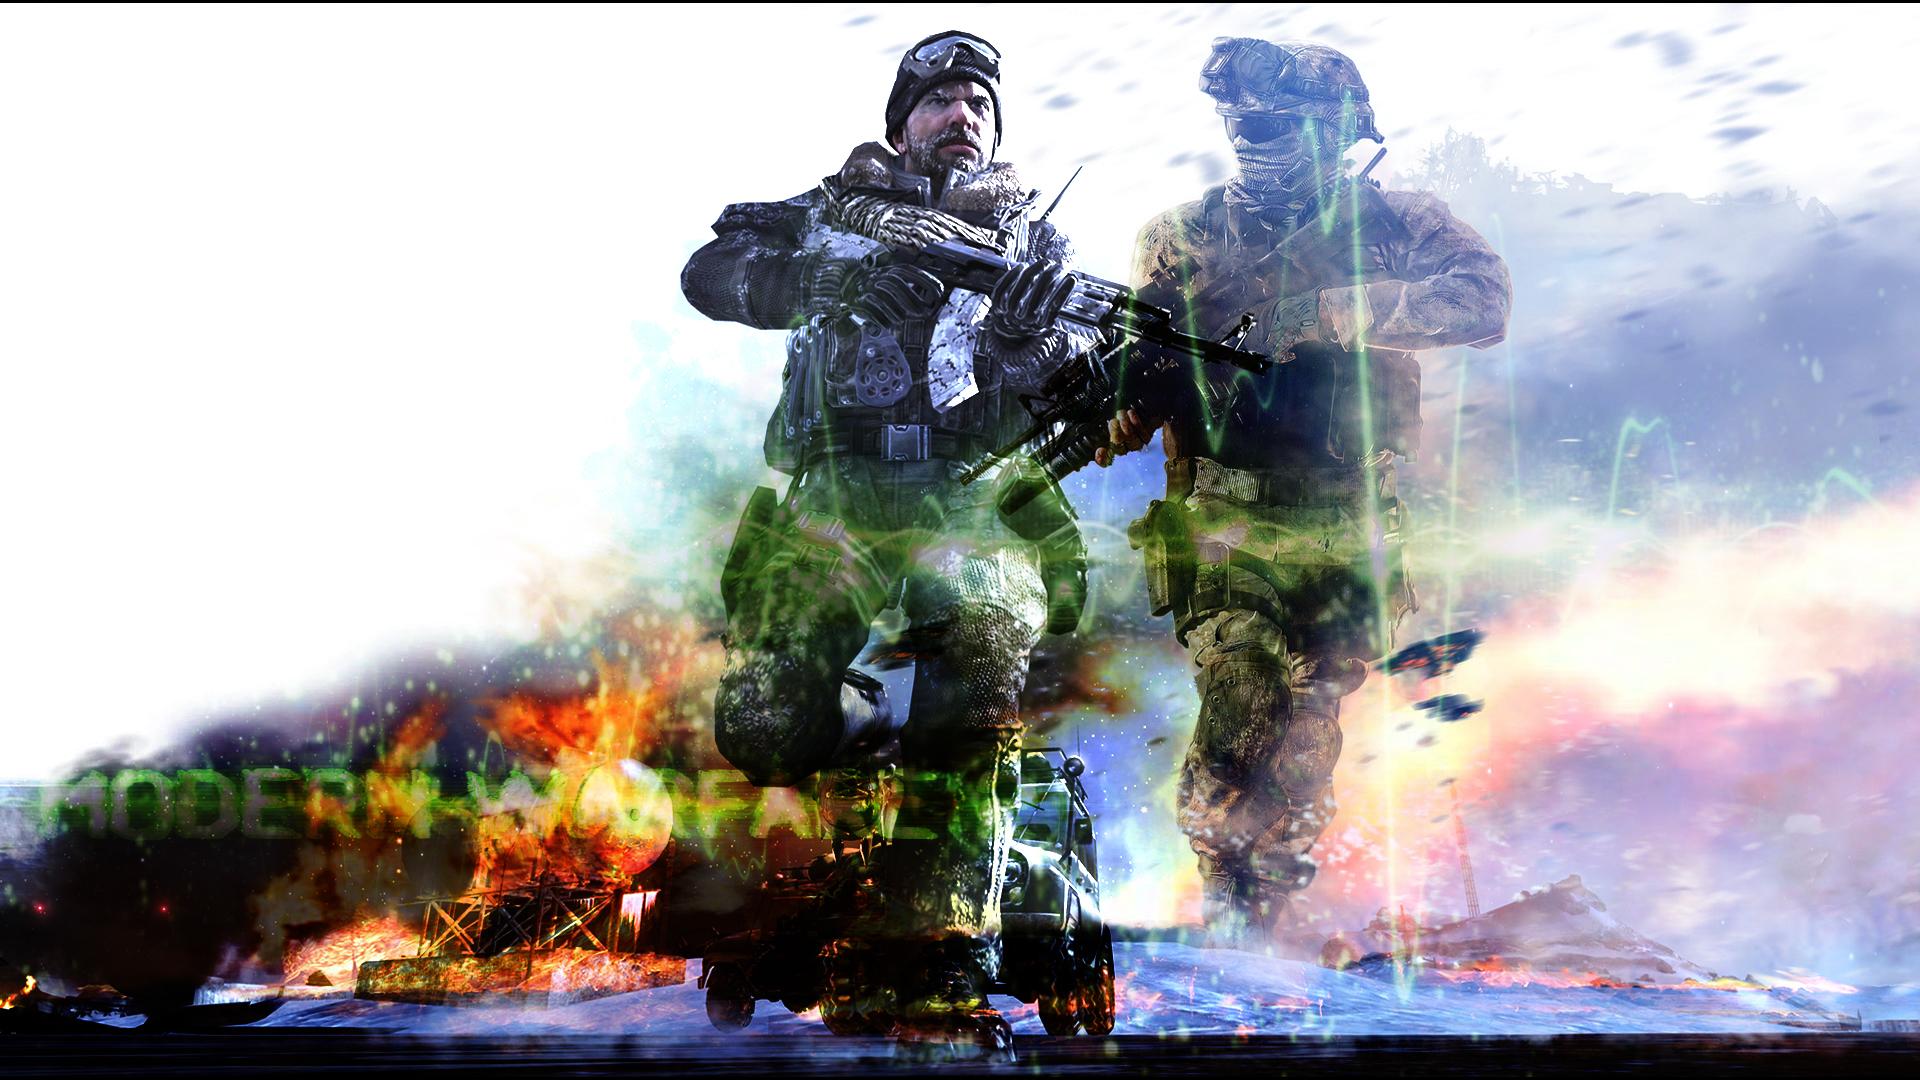 Preview Call Of Duty Modern Warfare 2 Wallpaper 1920x1080